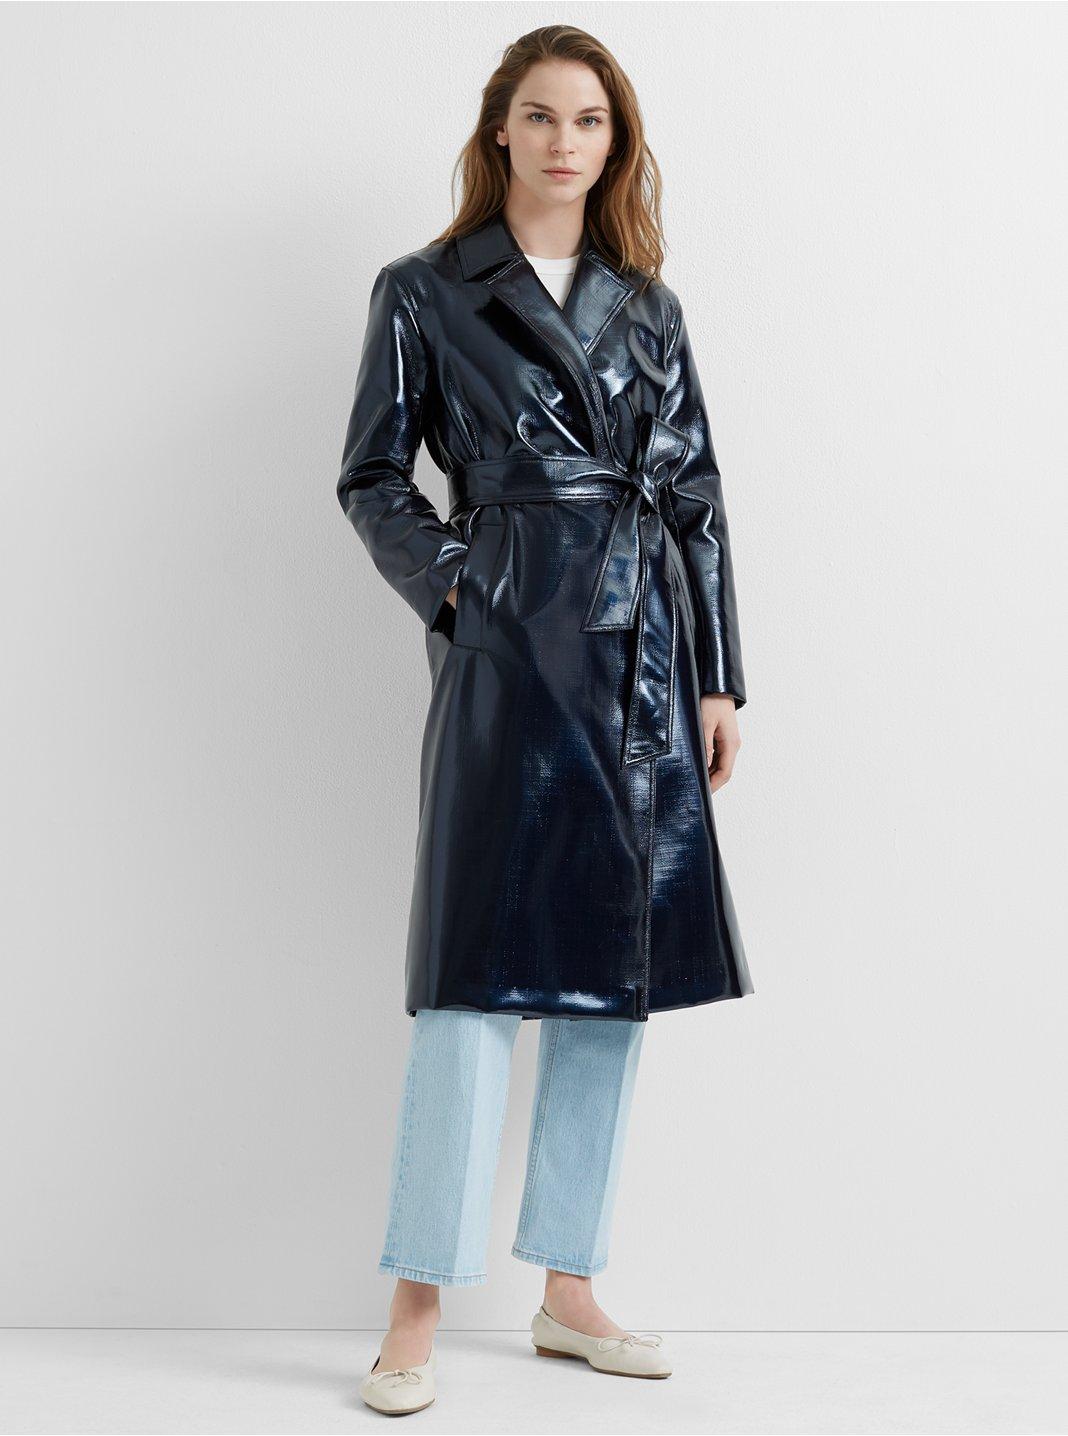 Lacquer Coat